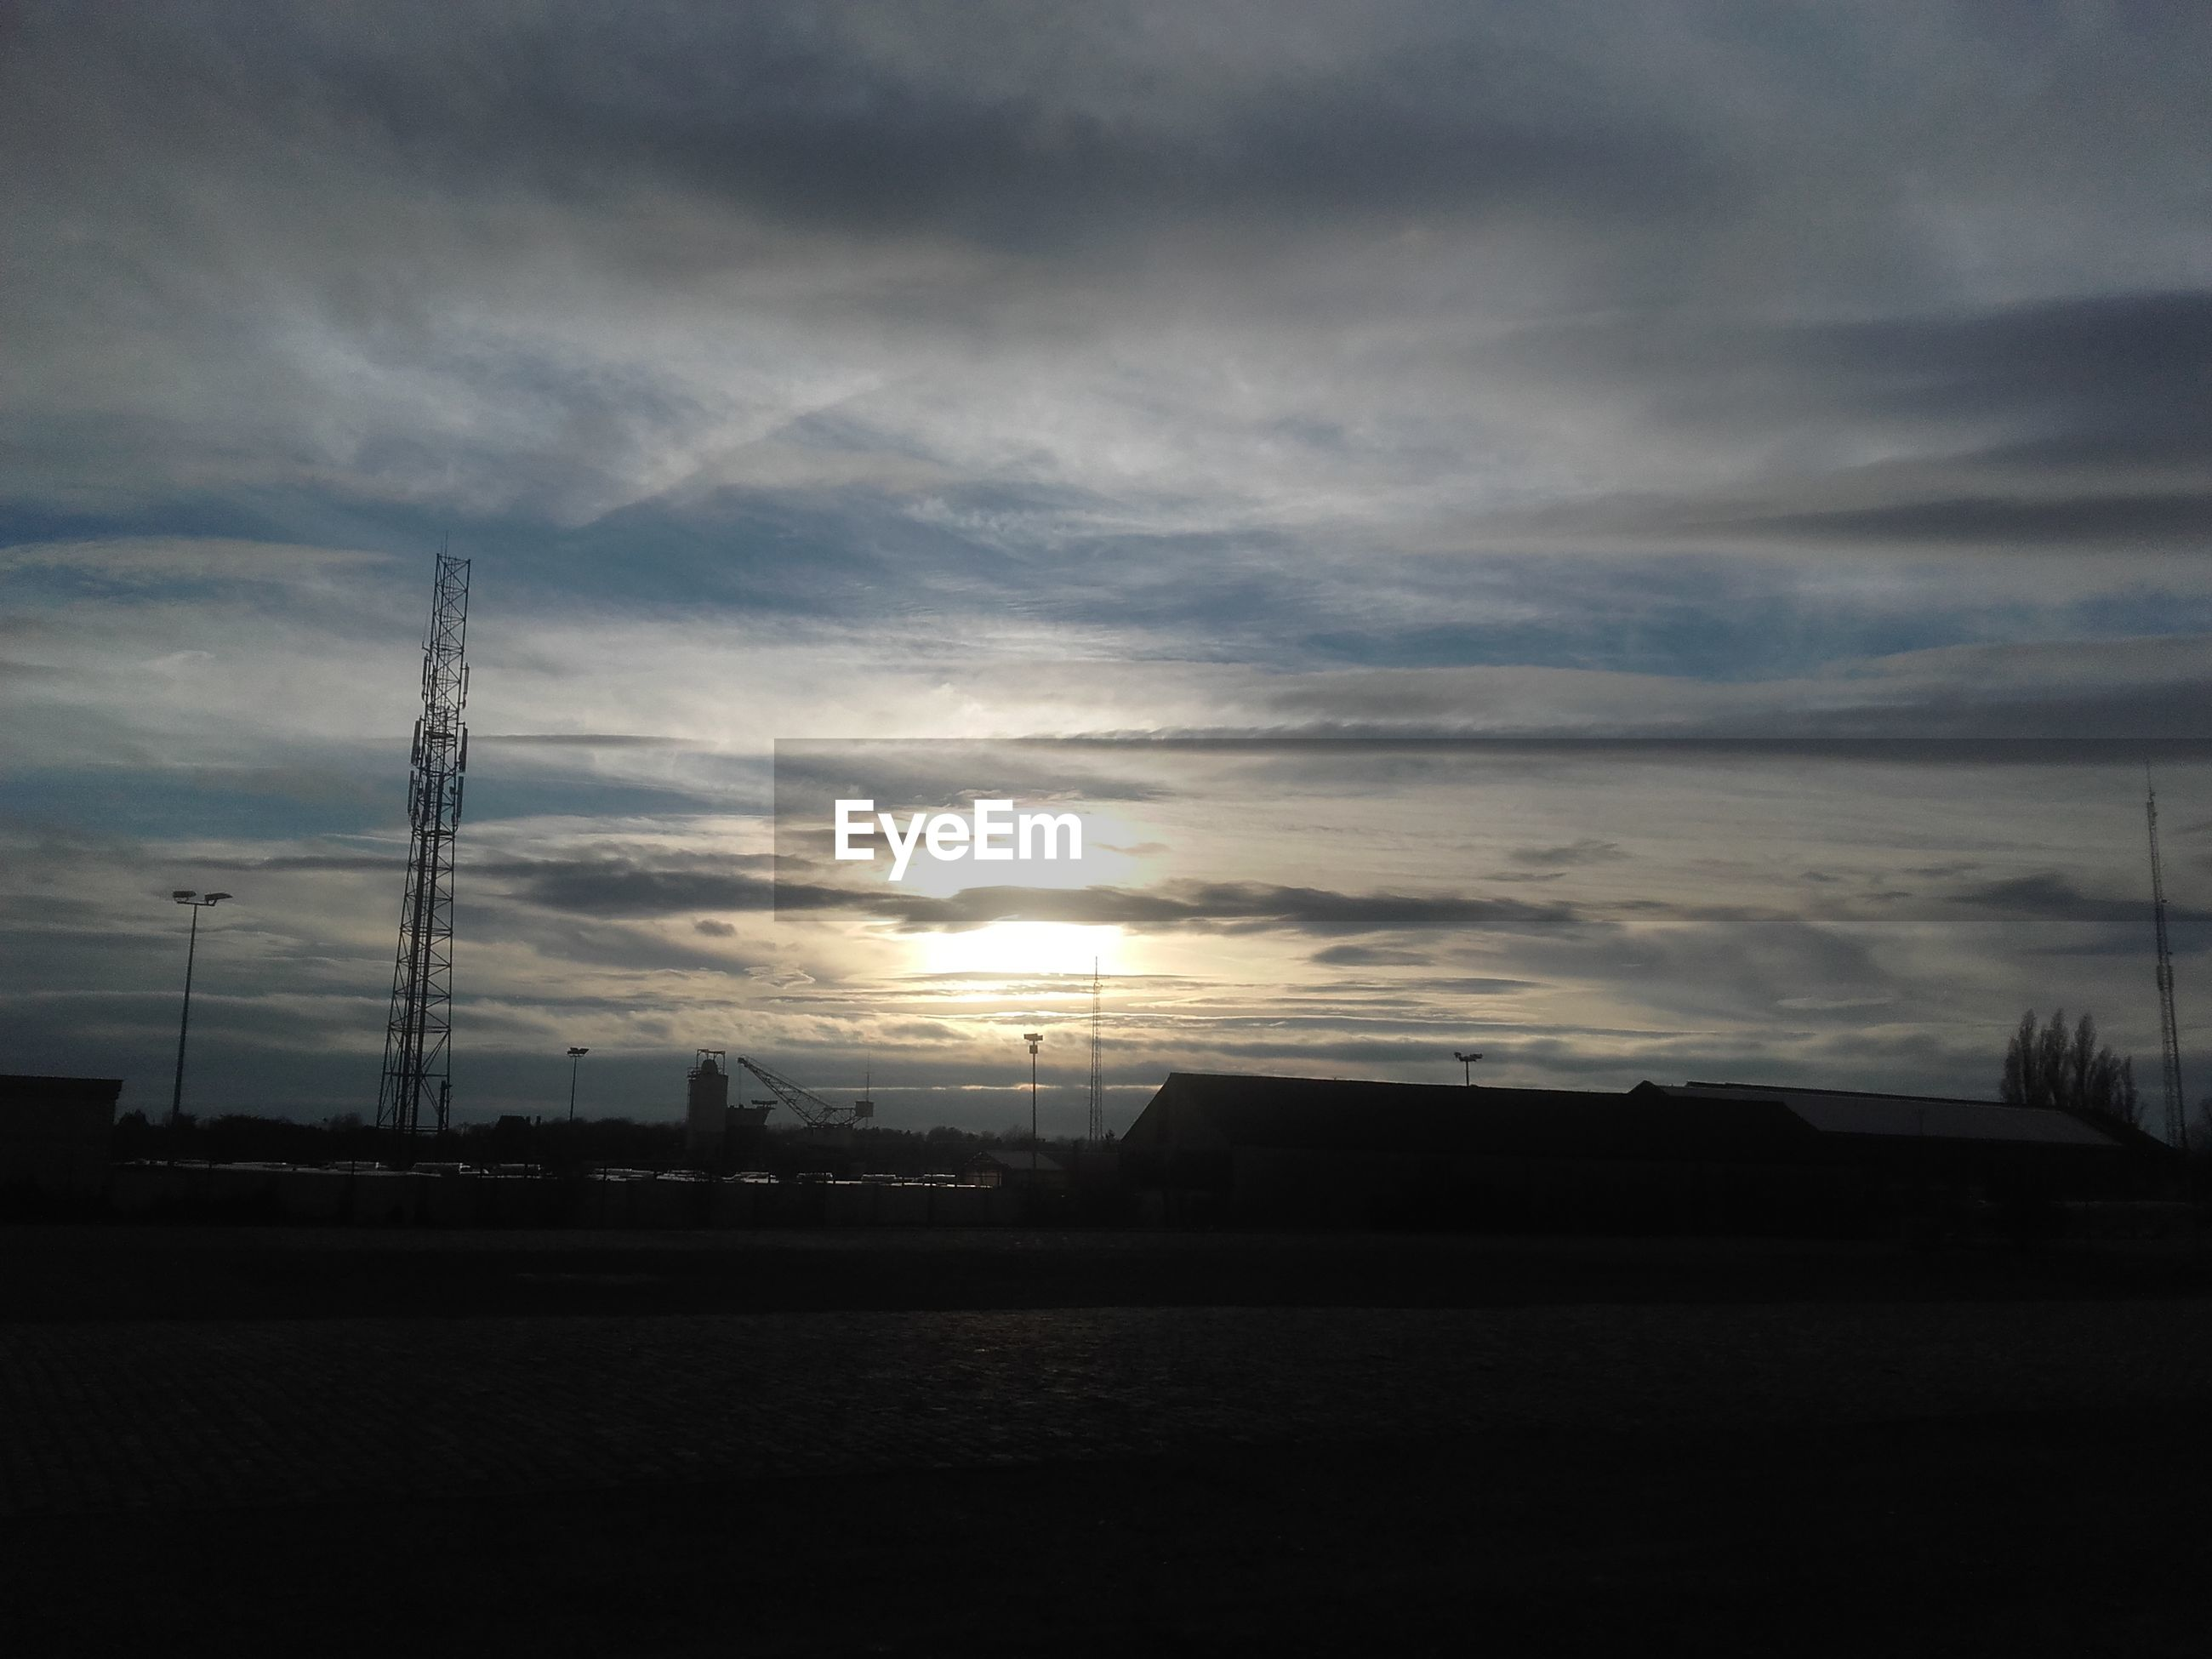 sunset, silhouette, sky, electricity pylon, cloud - sky, built structure, power line, architecture, building exterior, sun, connection, electricity, street light, cloud, orange color, cloudy, nature, sunlight, outdoors, dark